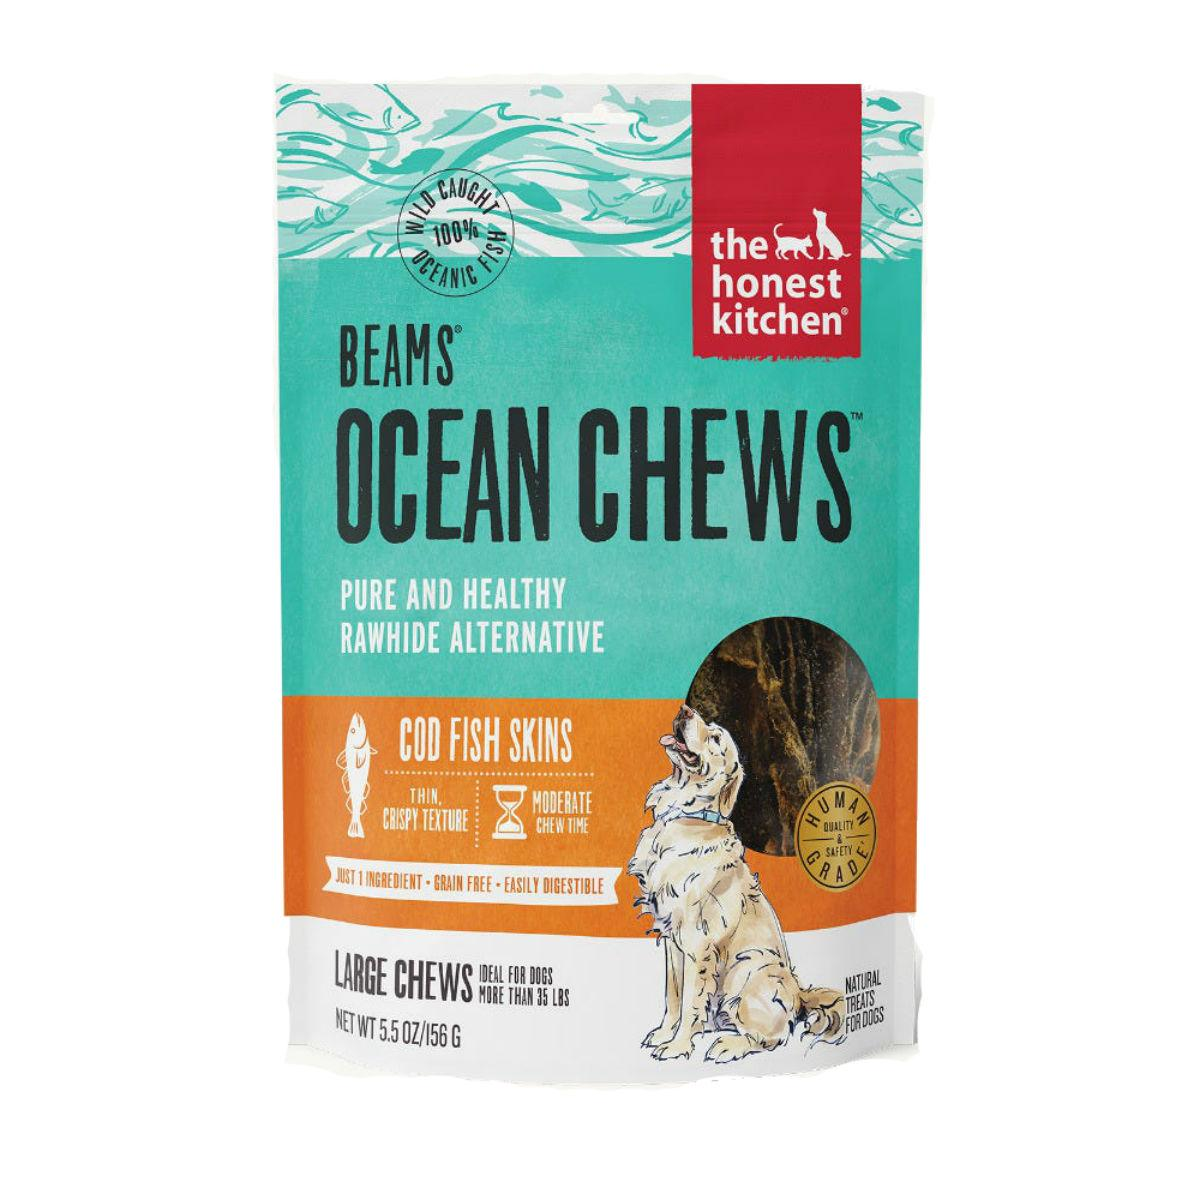 The Honest Kitchen Beams Ocean Chews Dog Treat - Cod Skin